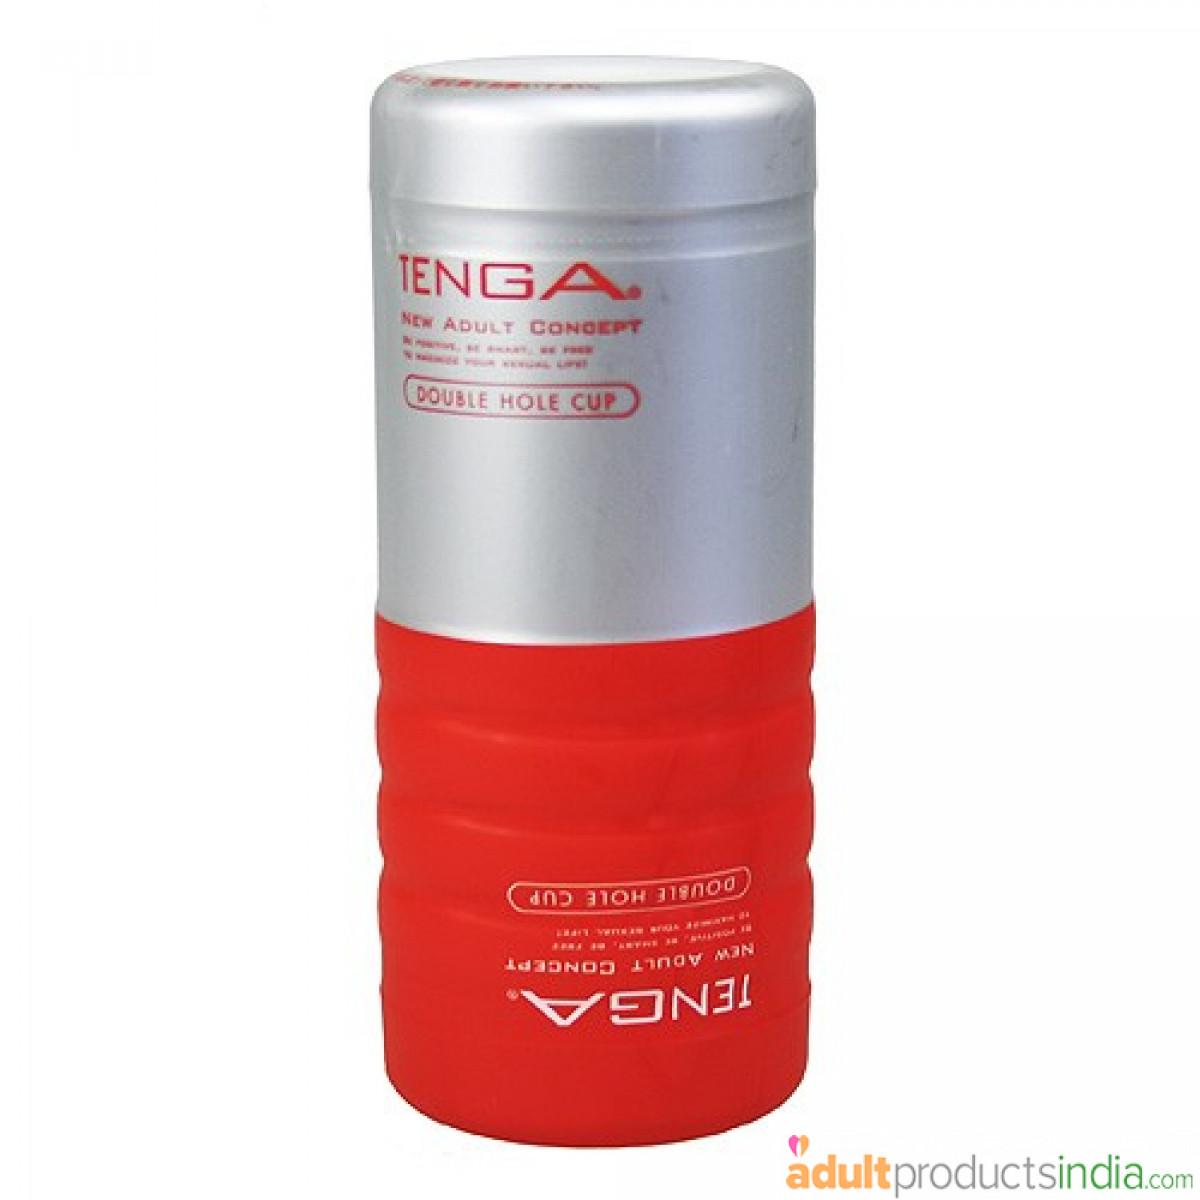 Tenga Double Hole Cup - 104